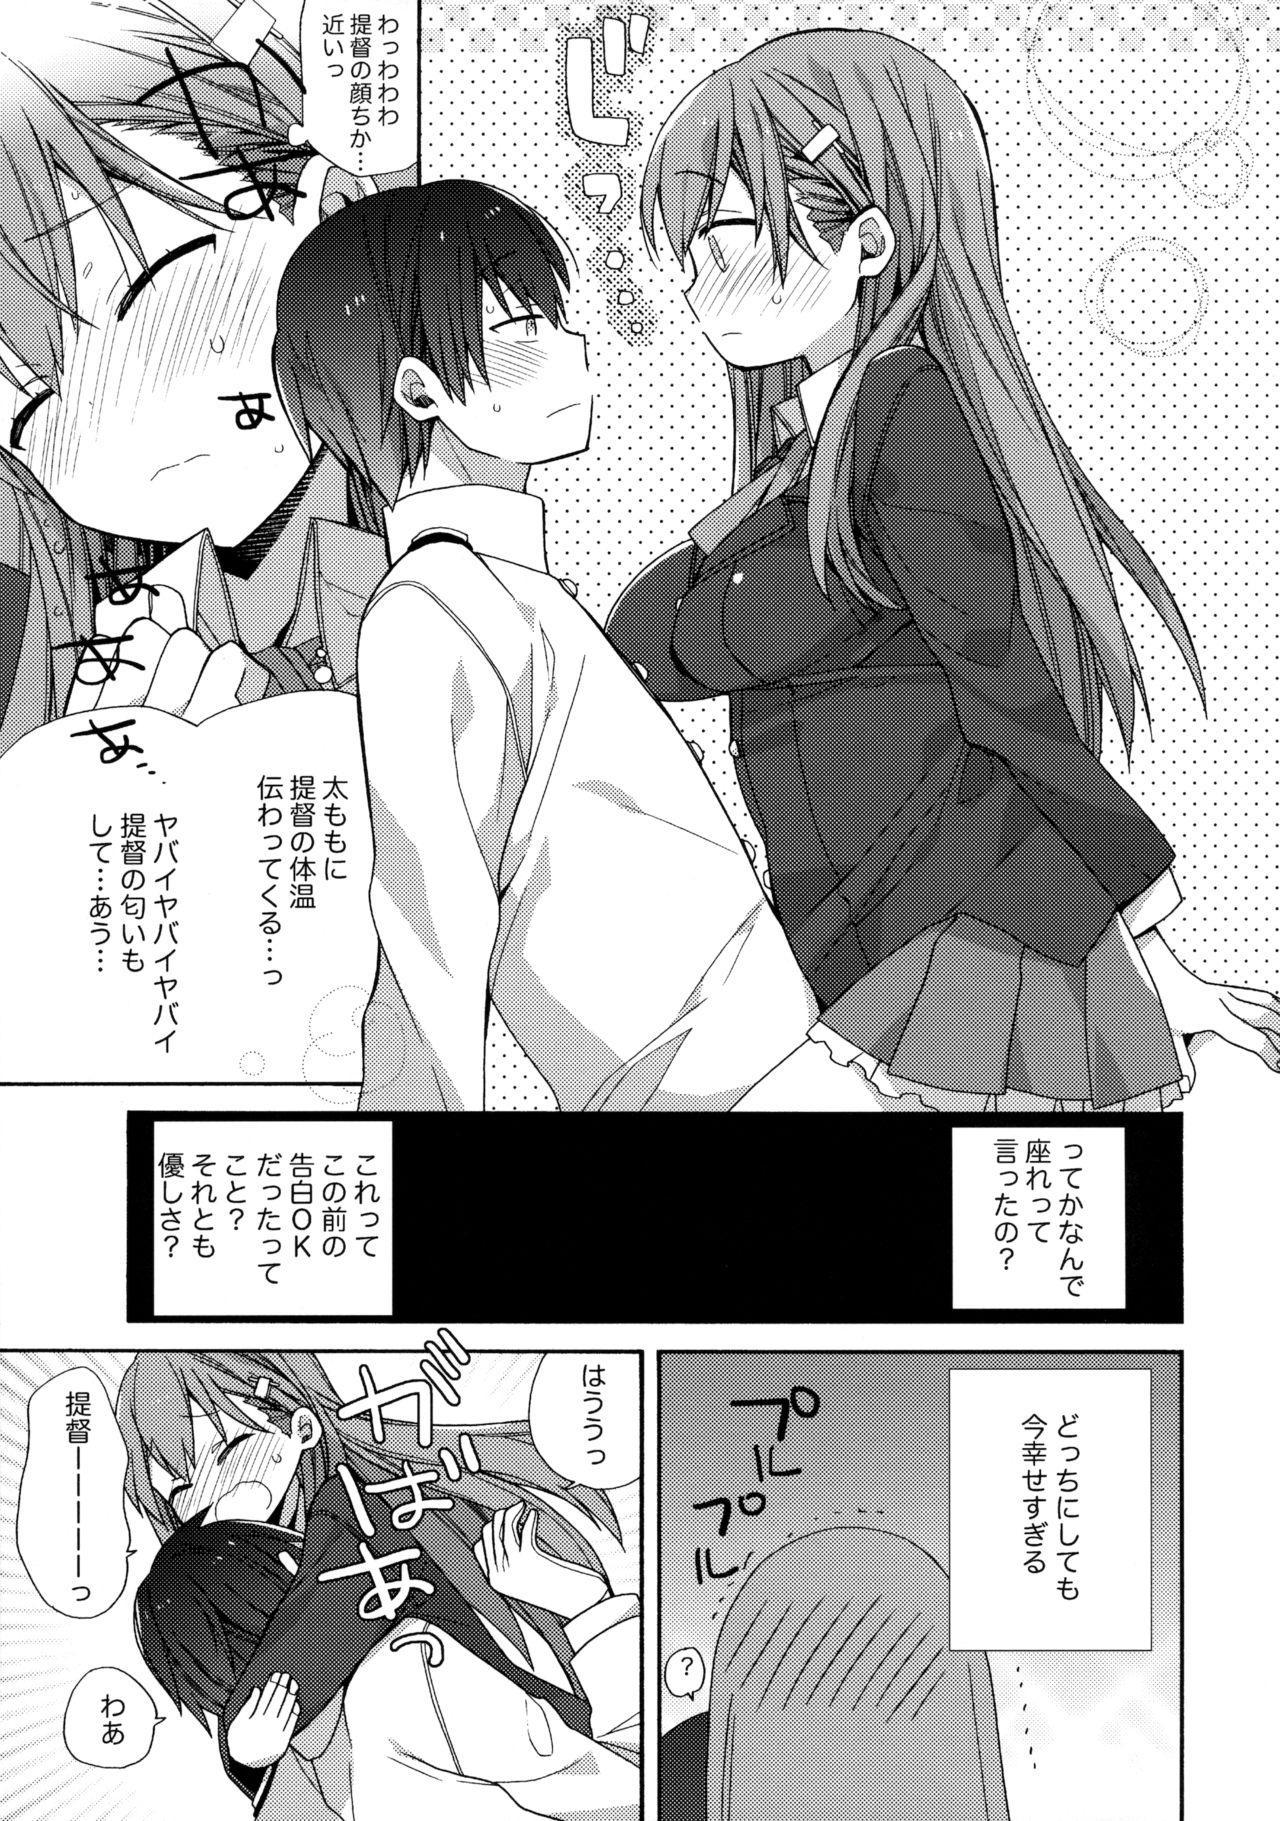 Kokuhaku Azassu Suzuya-chan 7